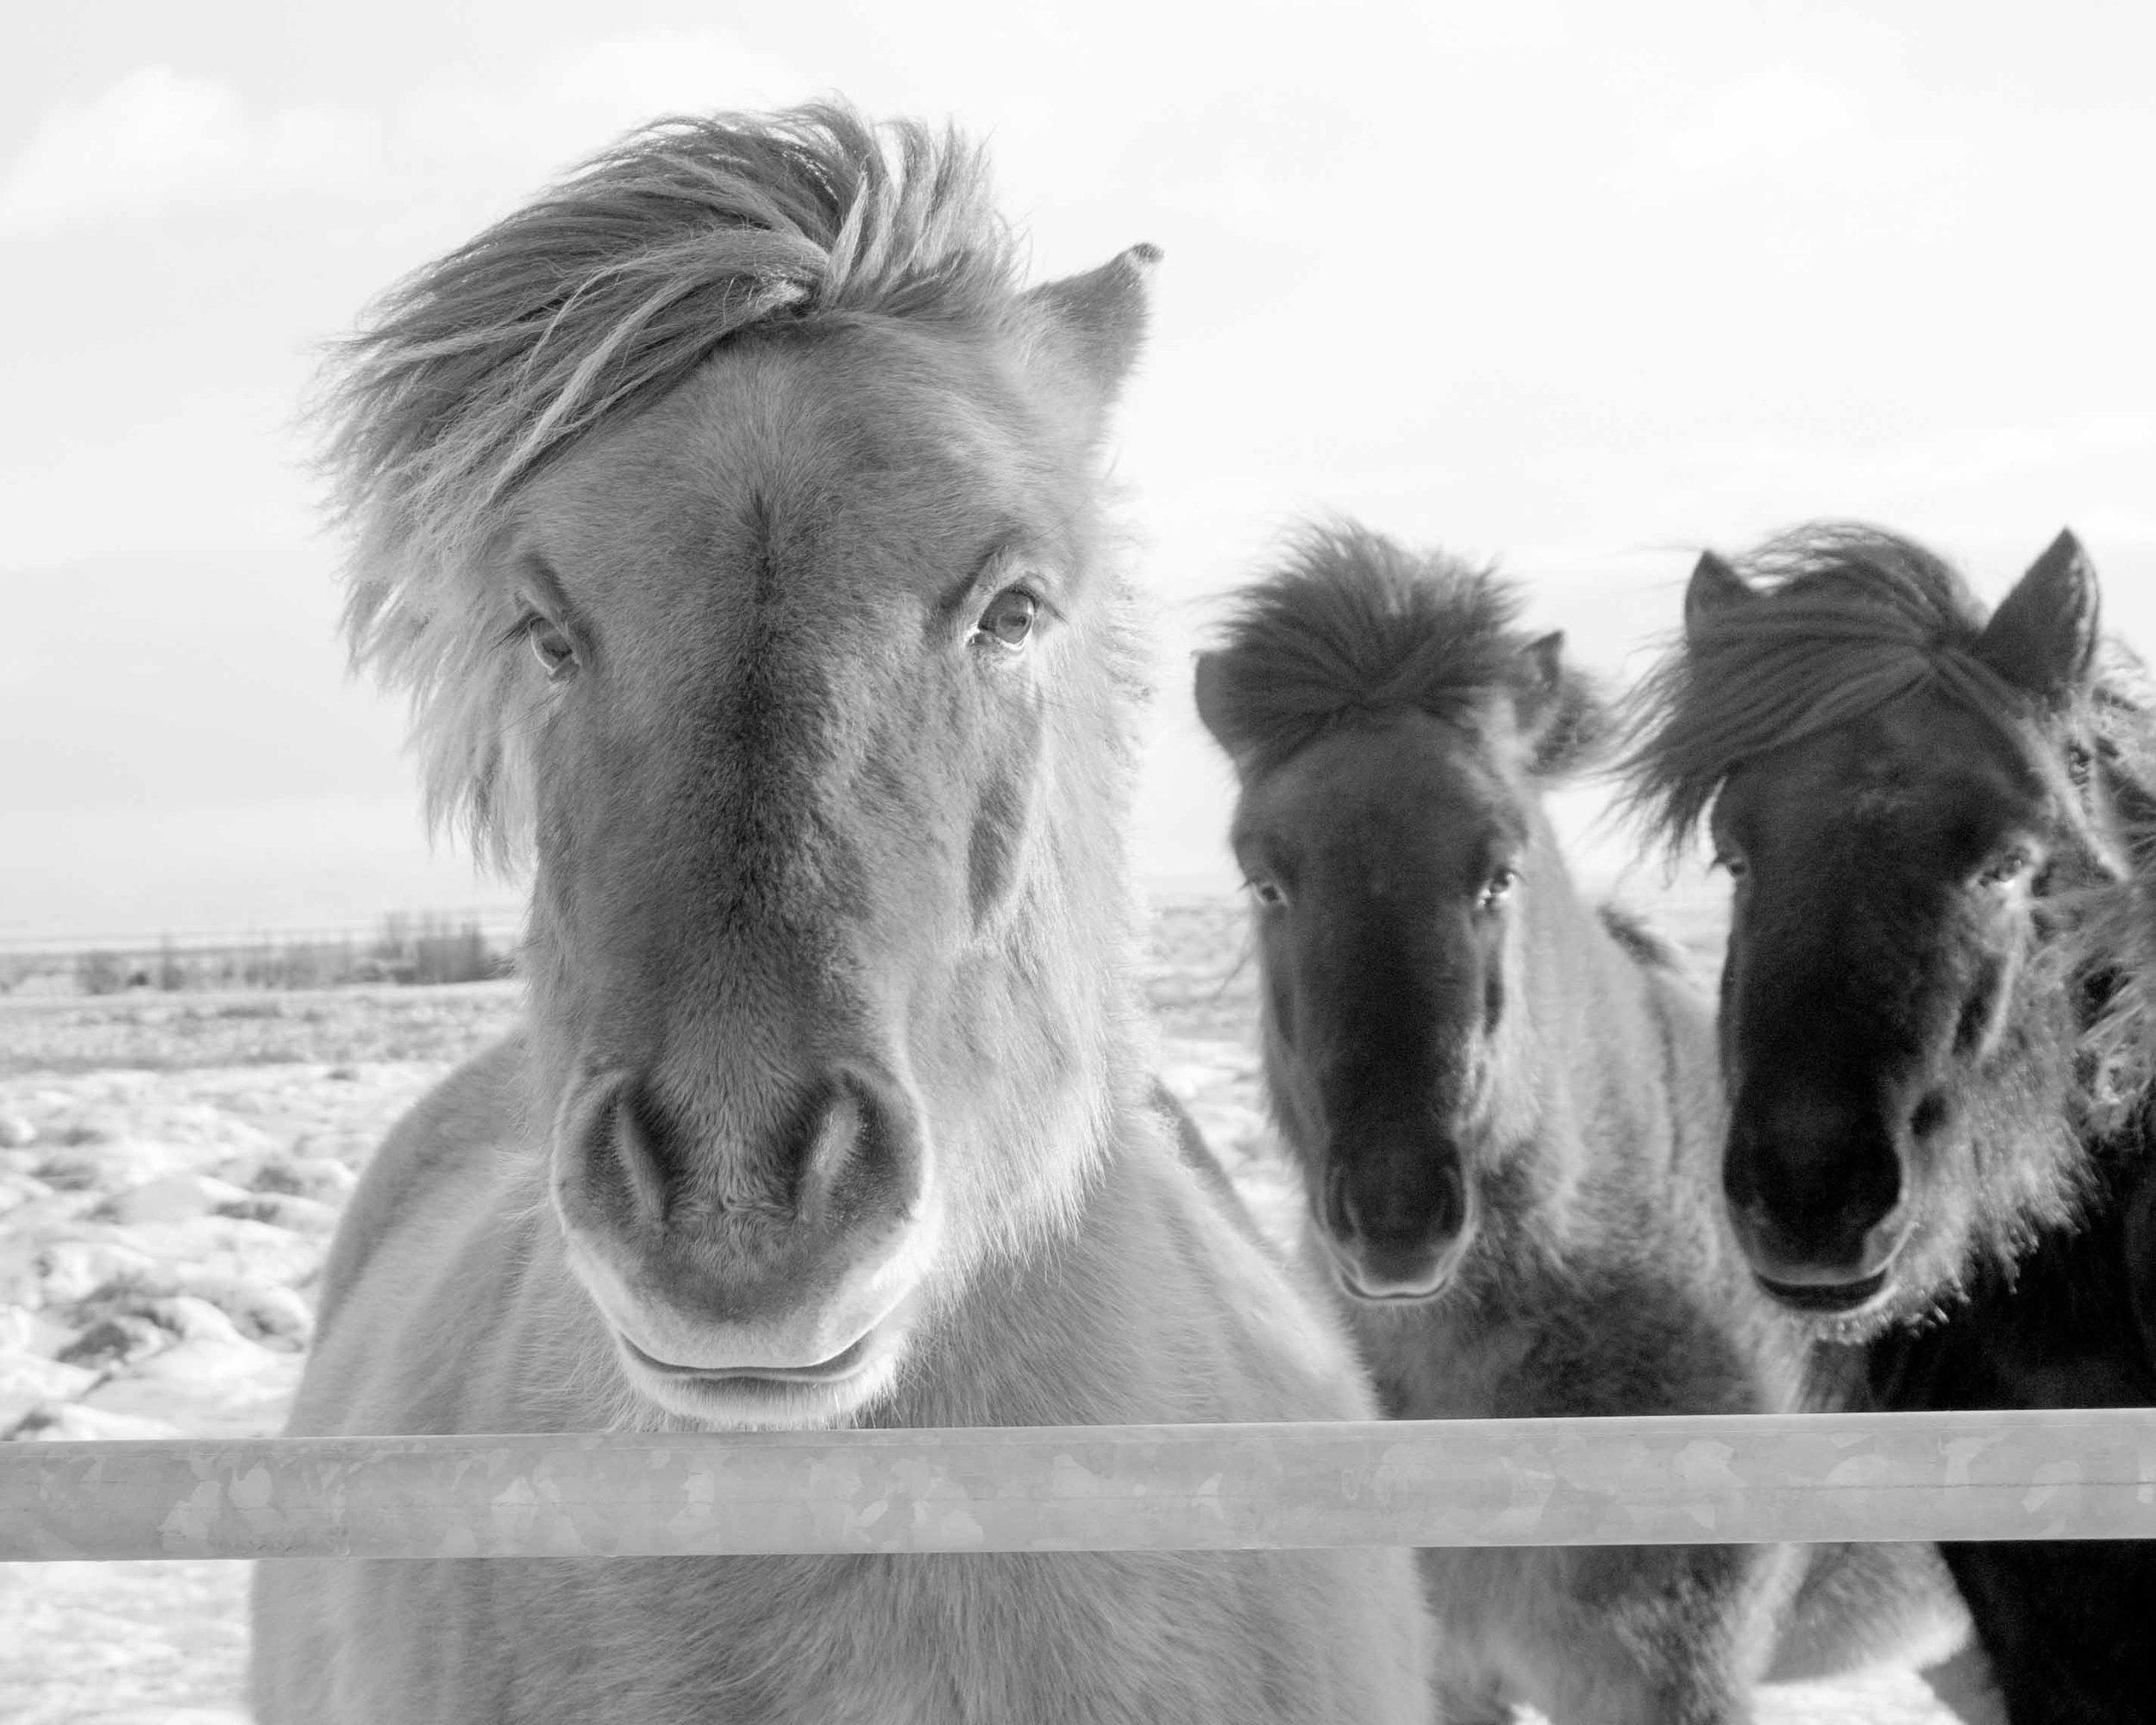 Iceland_Horses_11232017_05.jpg